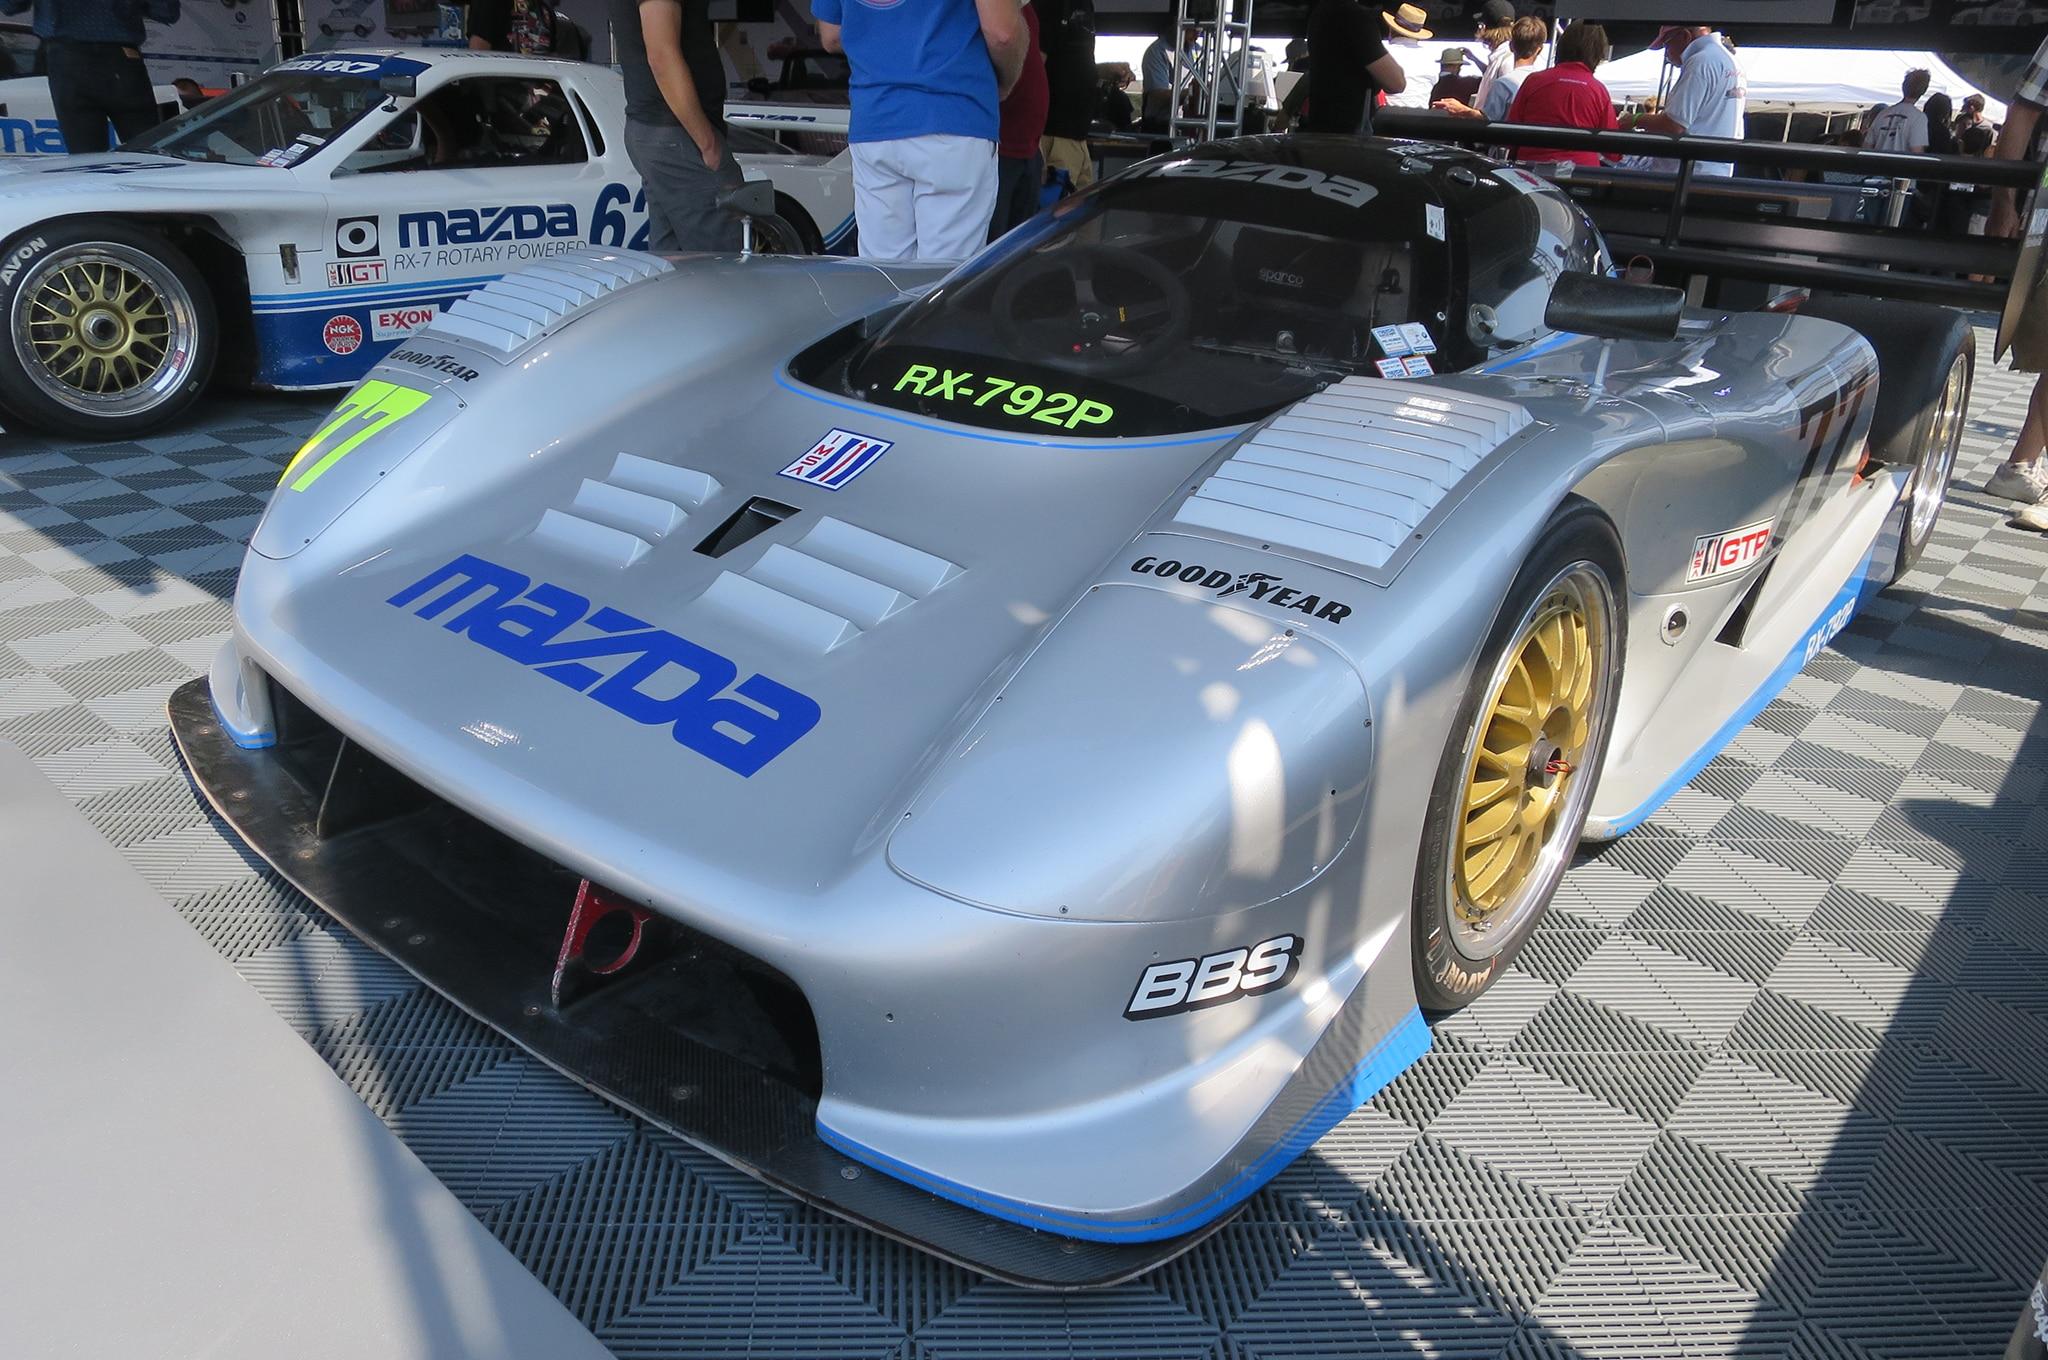 1991 Mazda RX 7 IMSA GTP front three quarters